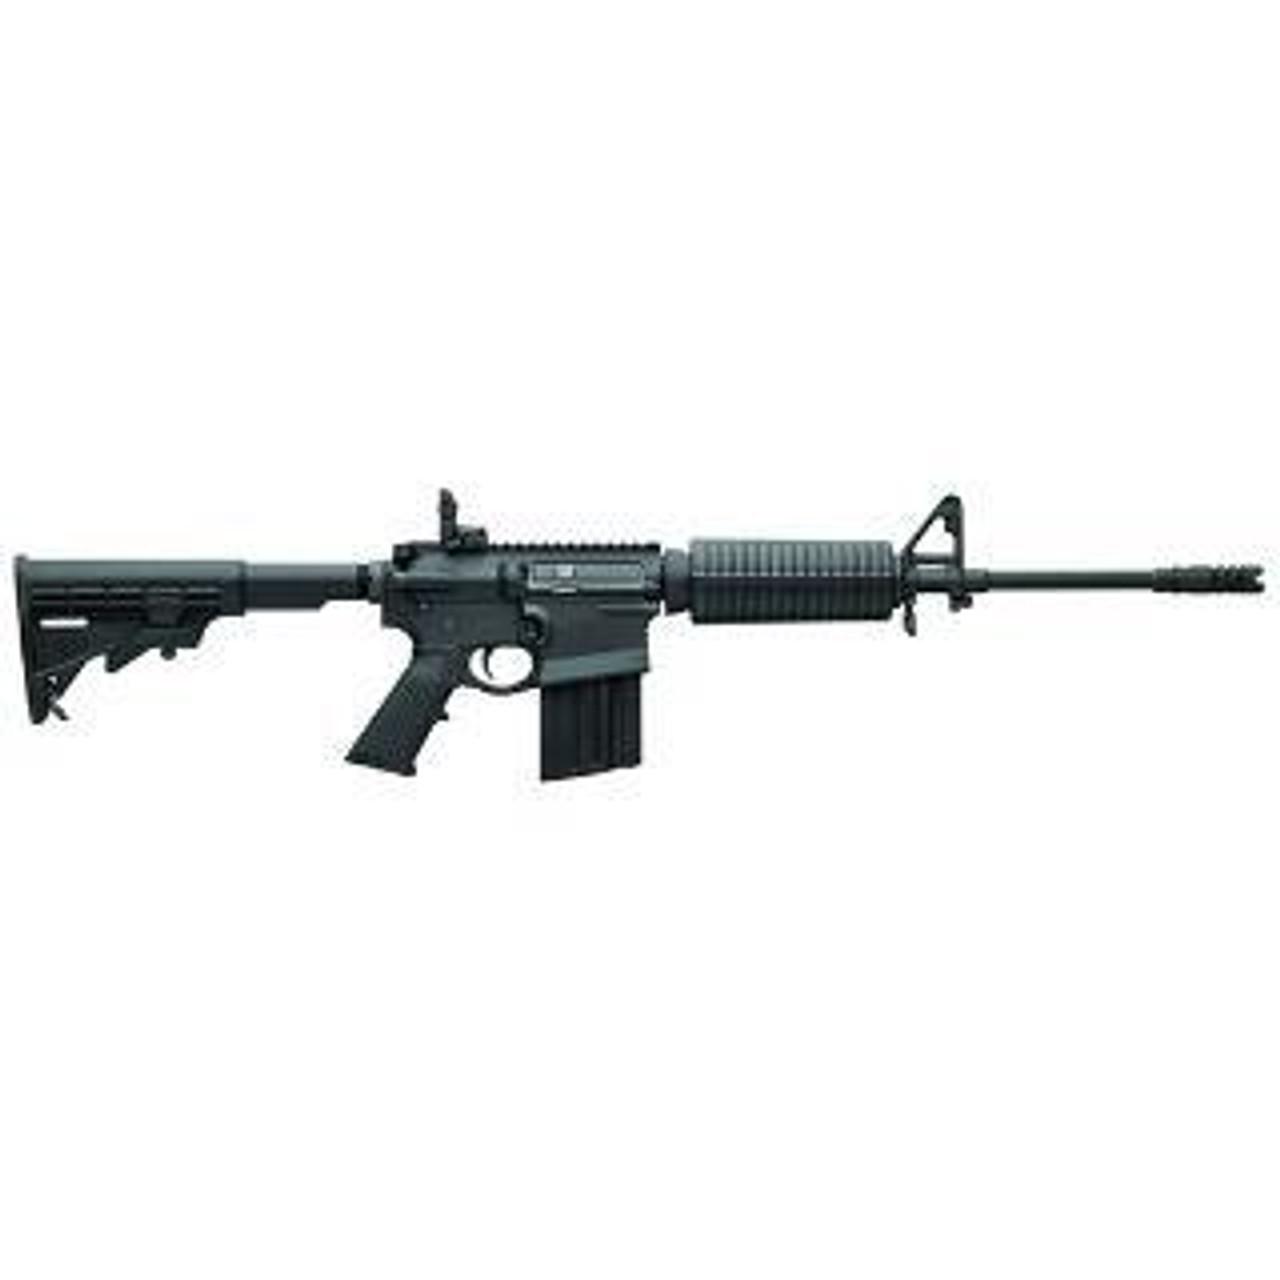 "DPMS RFLR-G2AP4 CALIFORNIA LEGAL .308 RIFLE 16"" BBL. 20-SH M4 6-POS STOCK"